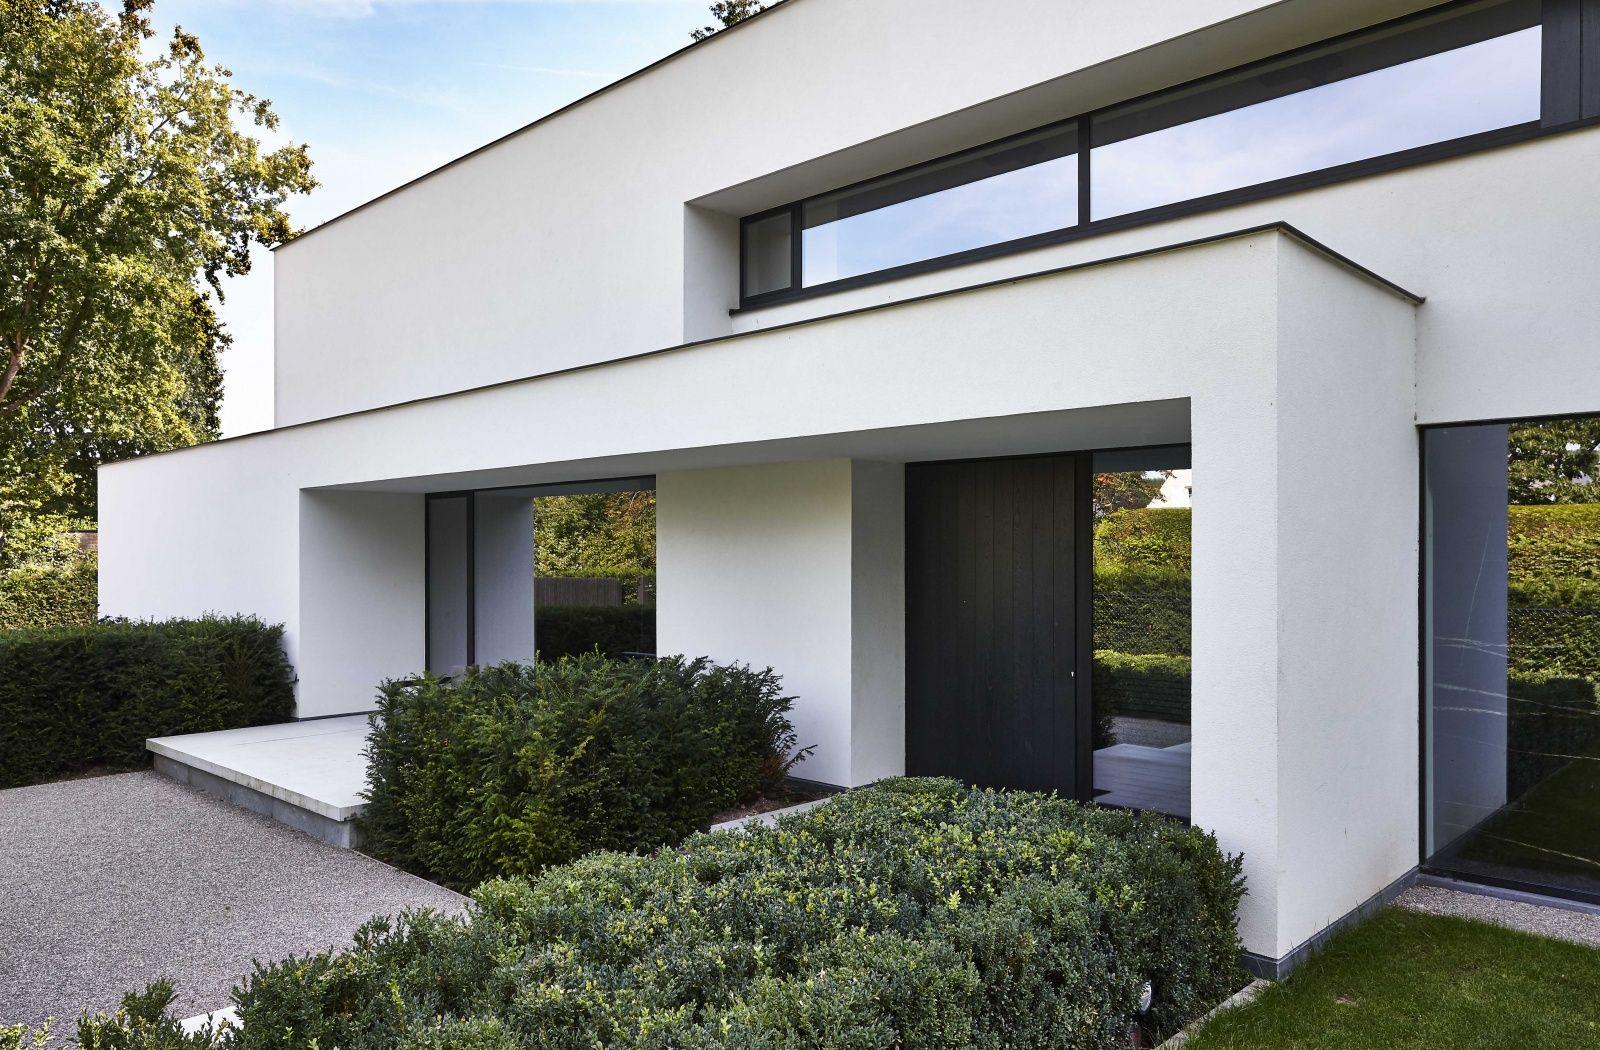 Dumobil   villabouw - woonprojecten   Moderne architectuur ...